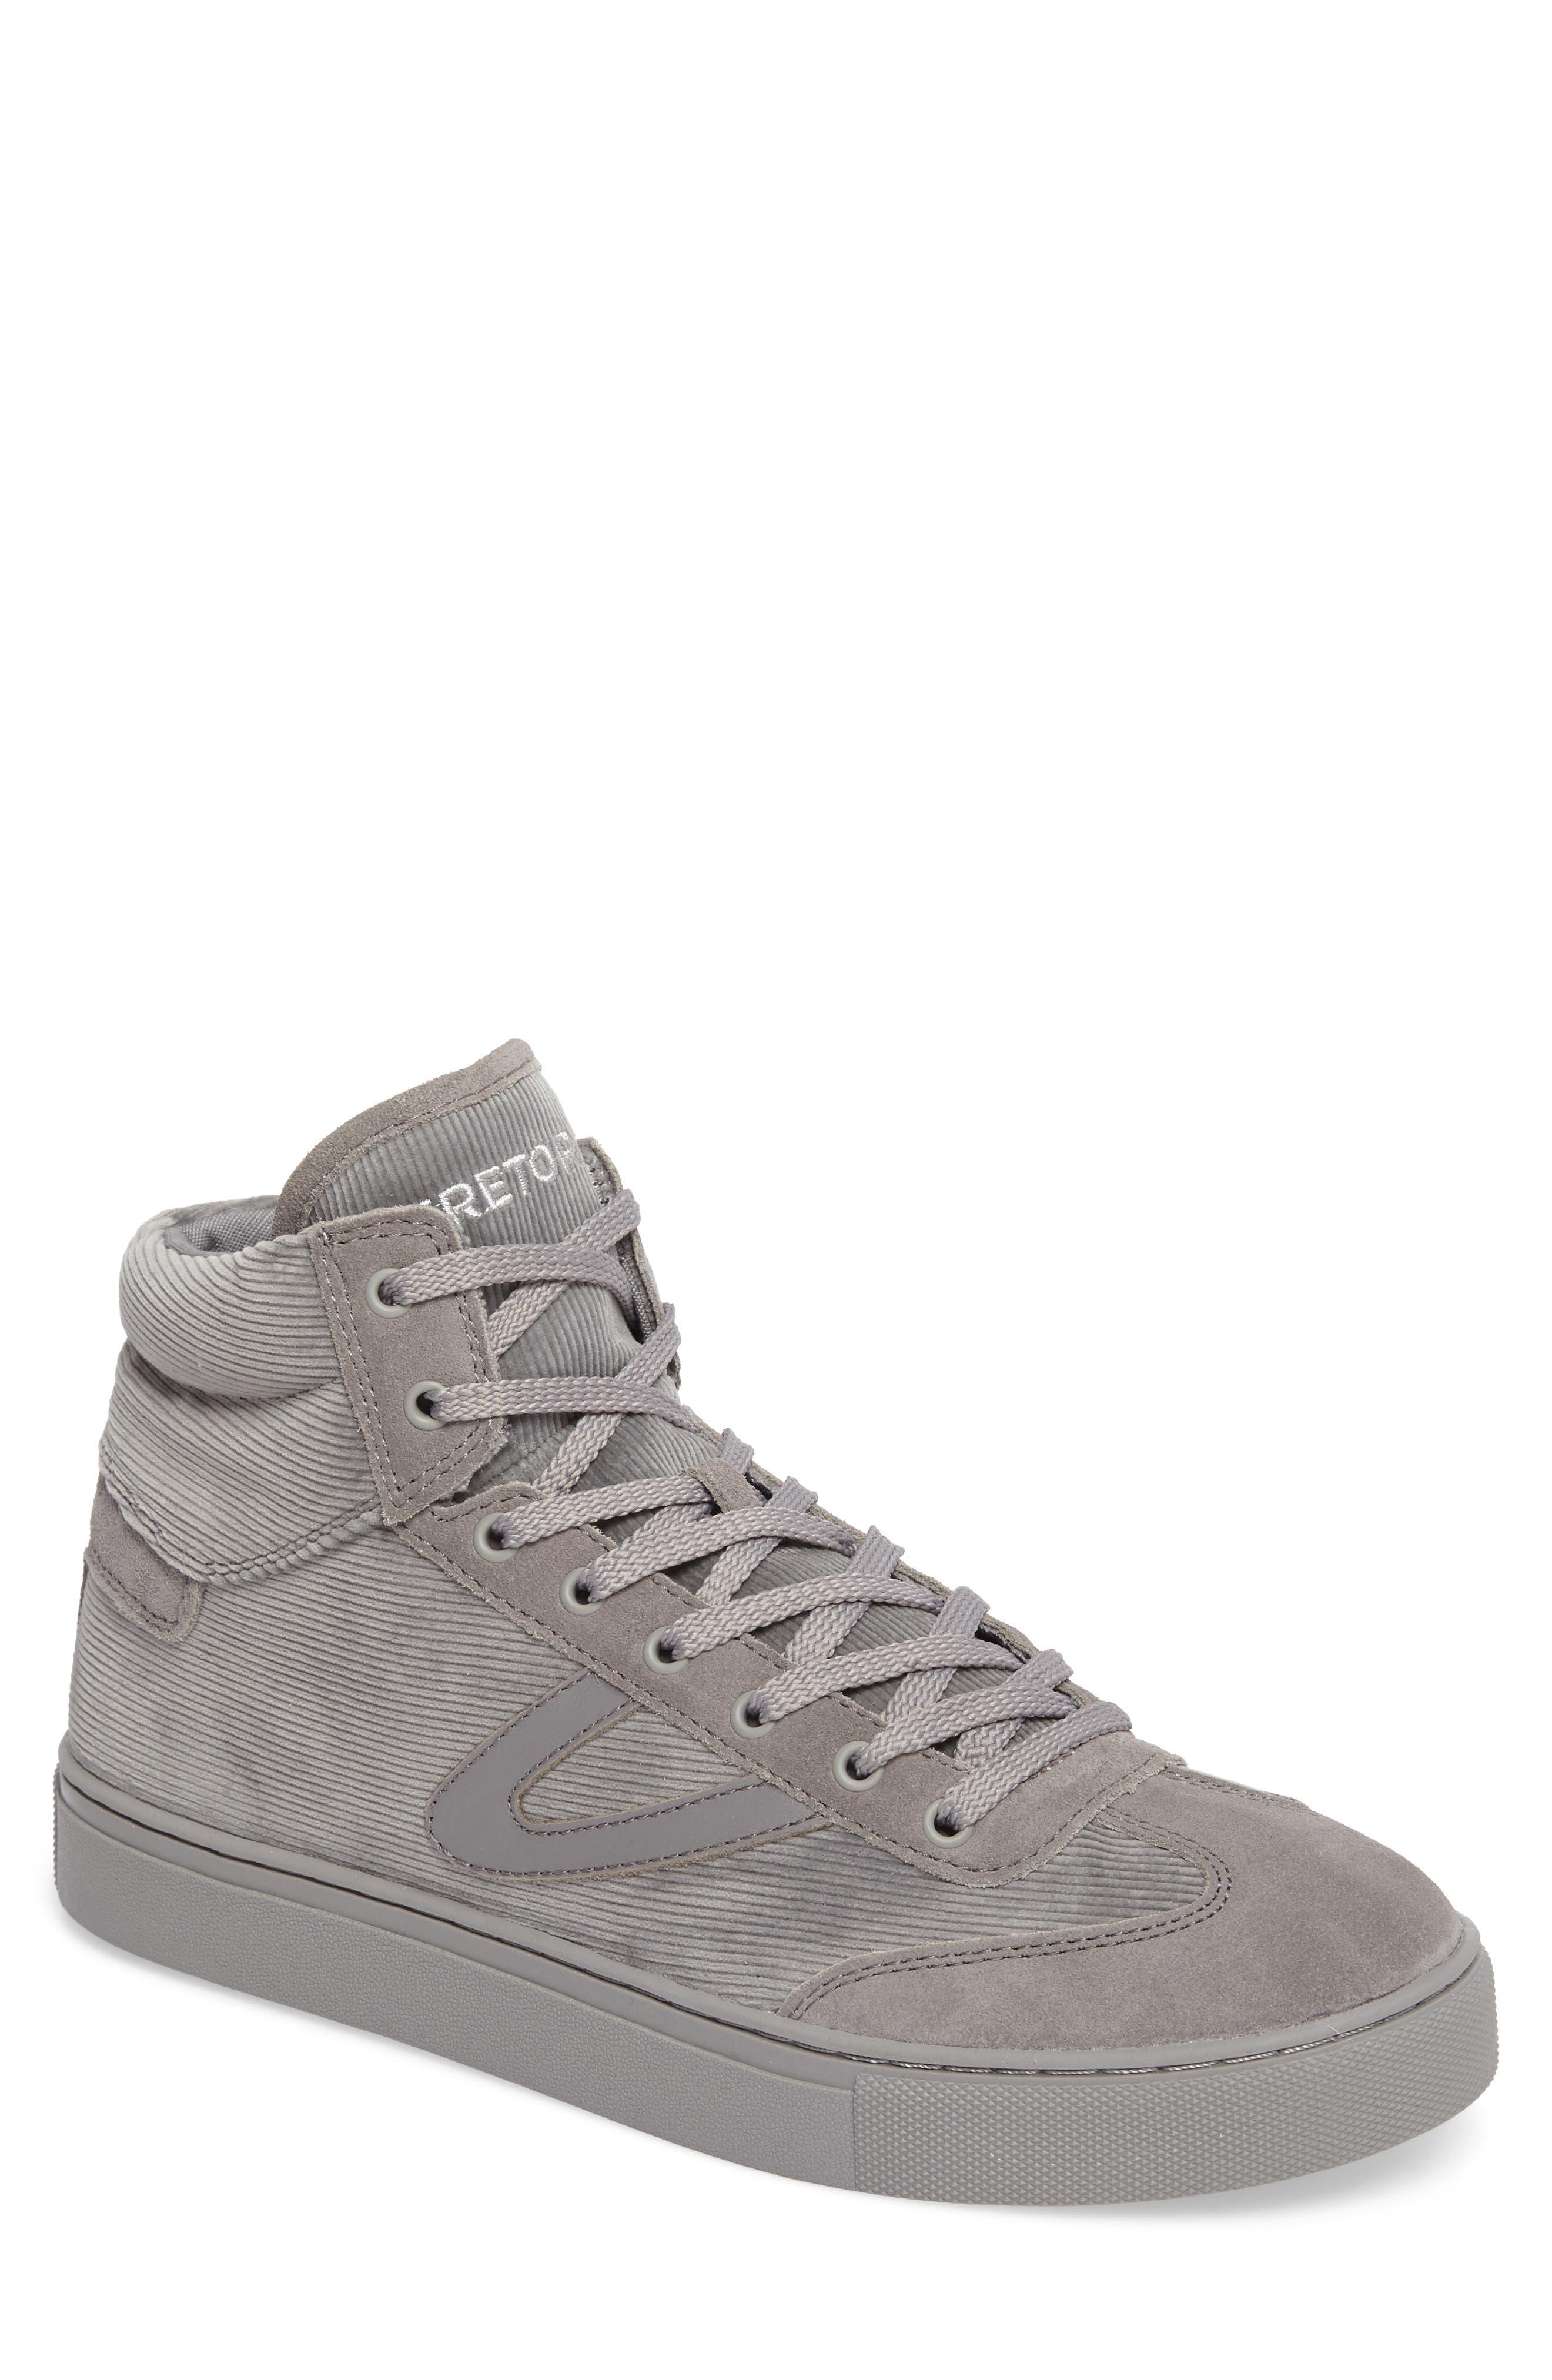 Tretorn Jack High Top Sneaker (Men